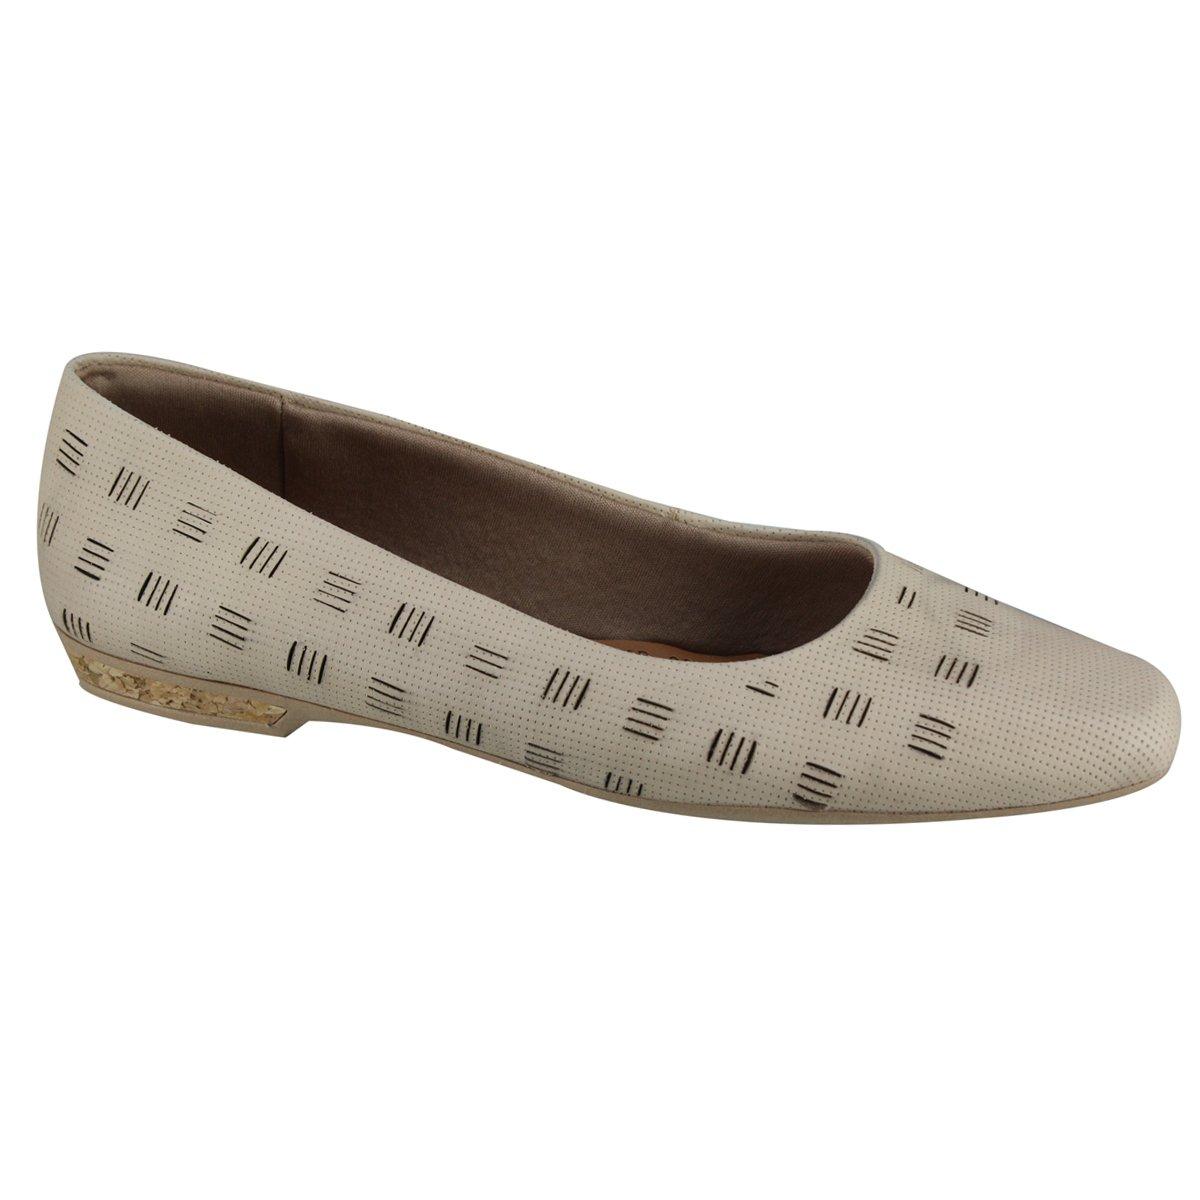 28ed46d9fa Sapato Feminino Usaflex AA1503 7 - Blush (Napa Nobre) - Calçados ...